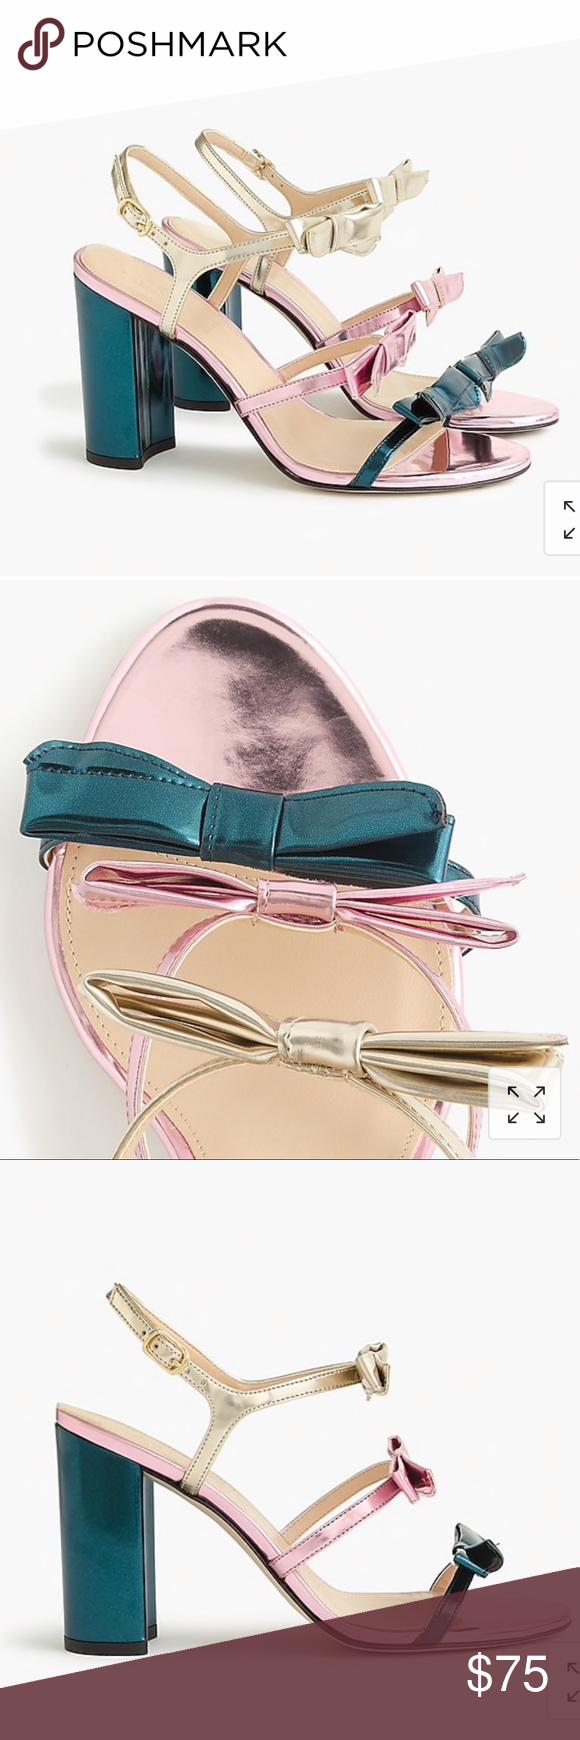 b982cc11d9b5 J.Crew Stella bow heels in metallic emerald Dainty bow-embellished straps